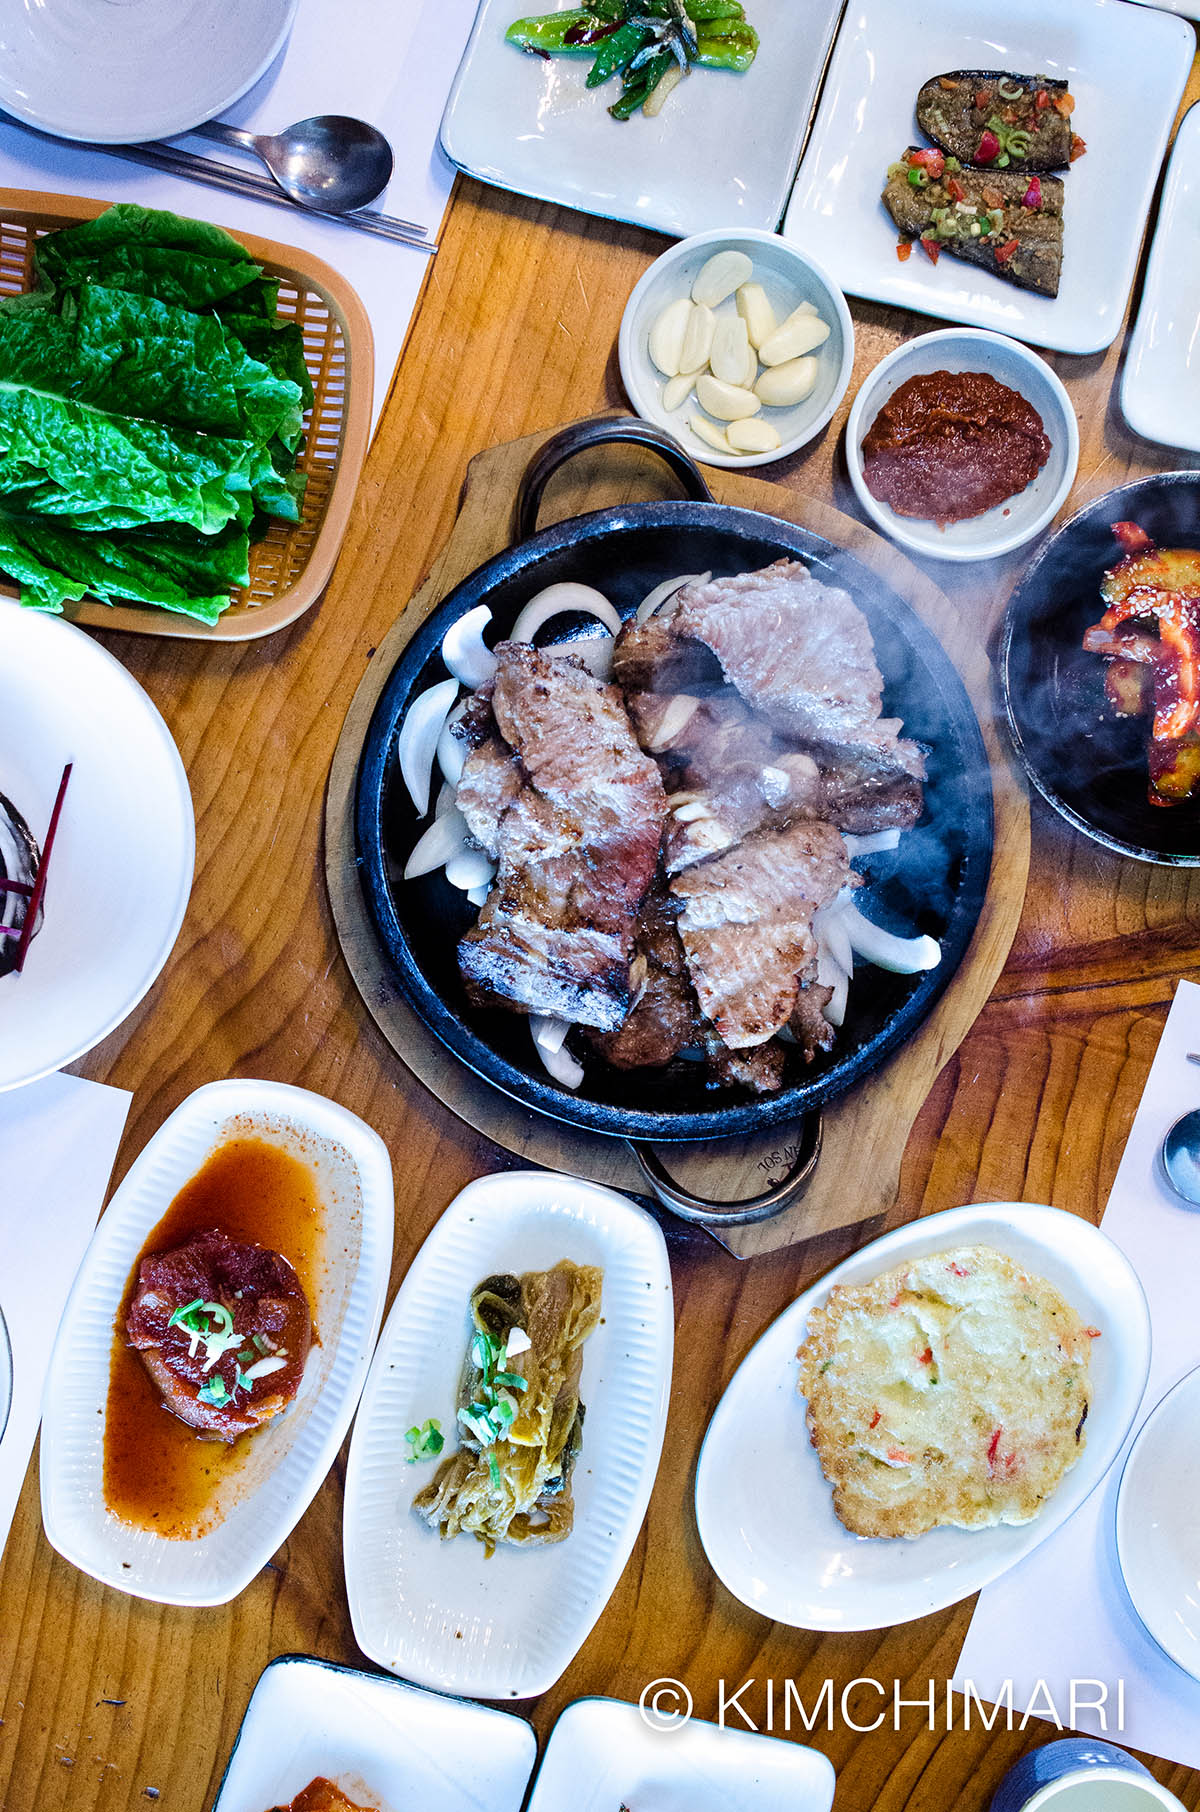 Best Jeonju Restaurant For Pork Bbq